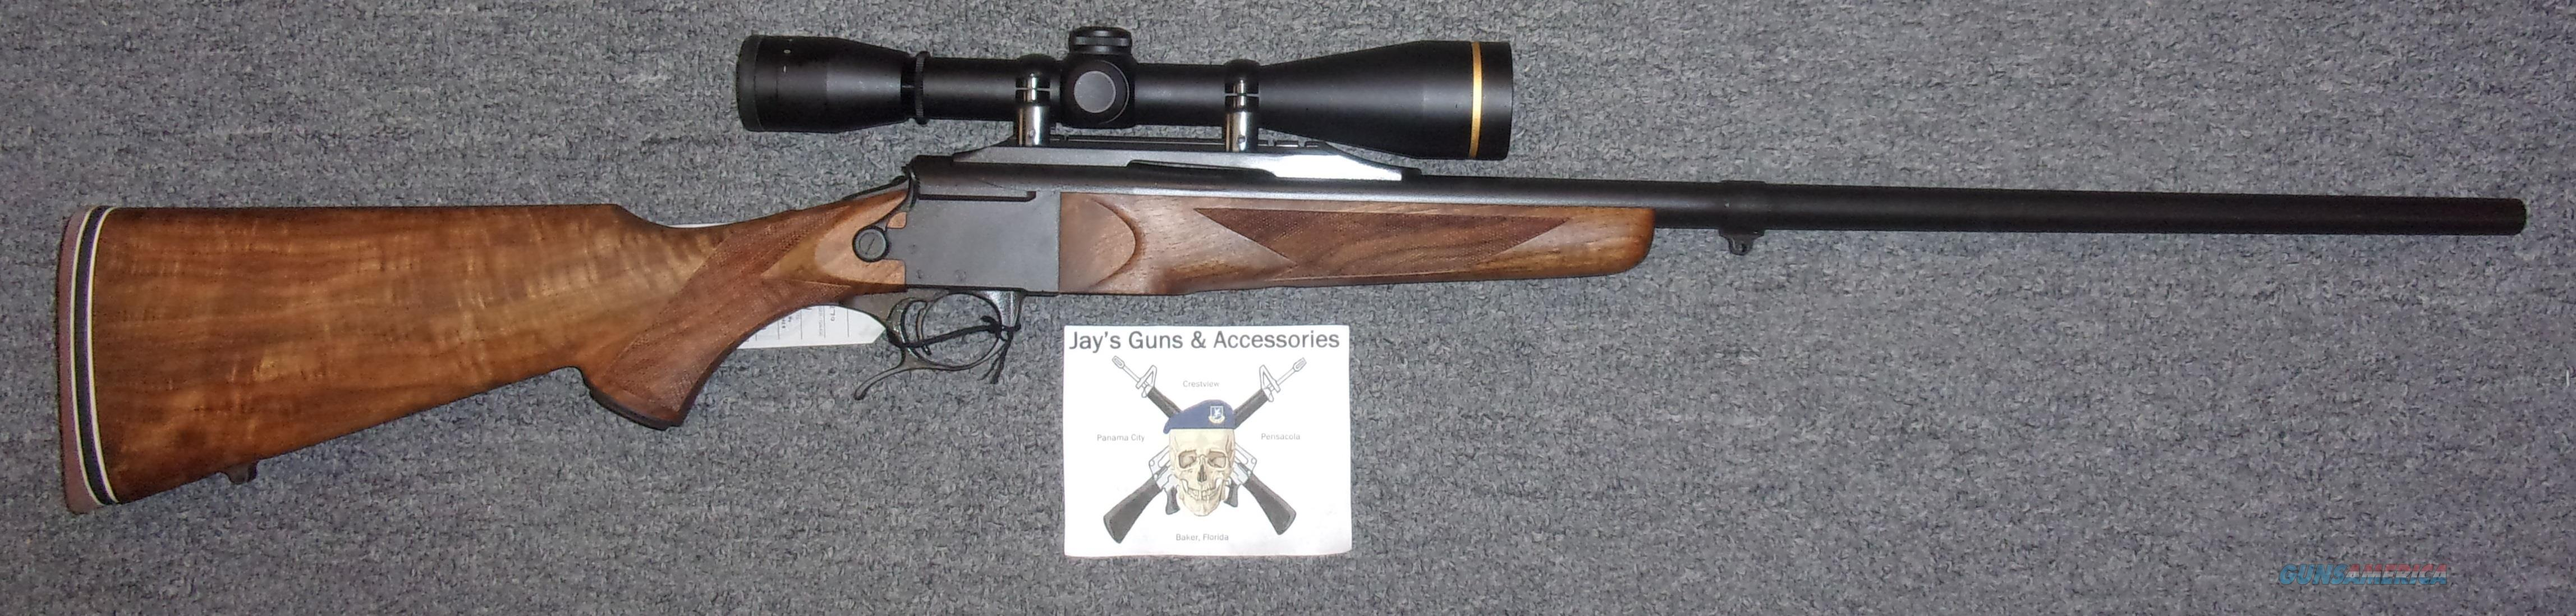 Luxus Arms 11 w/Scope  Guns > Rifles > Custom Rifles > Other